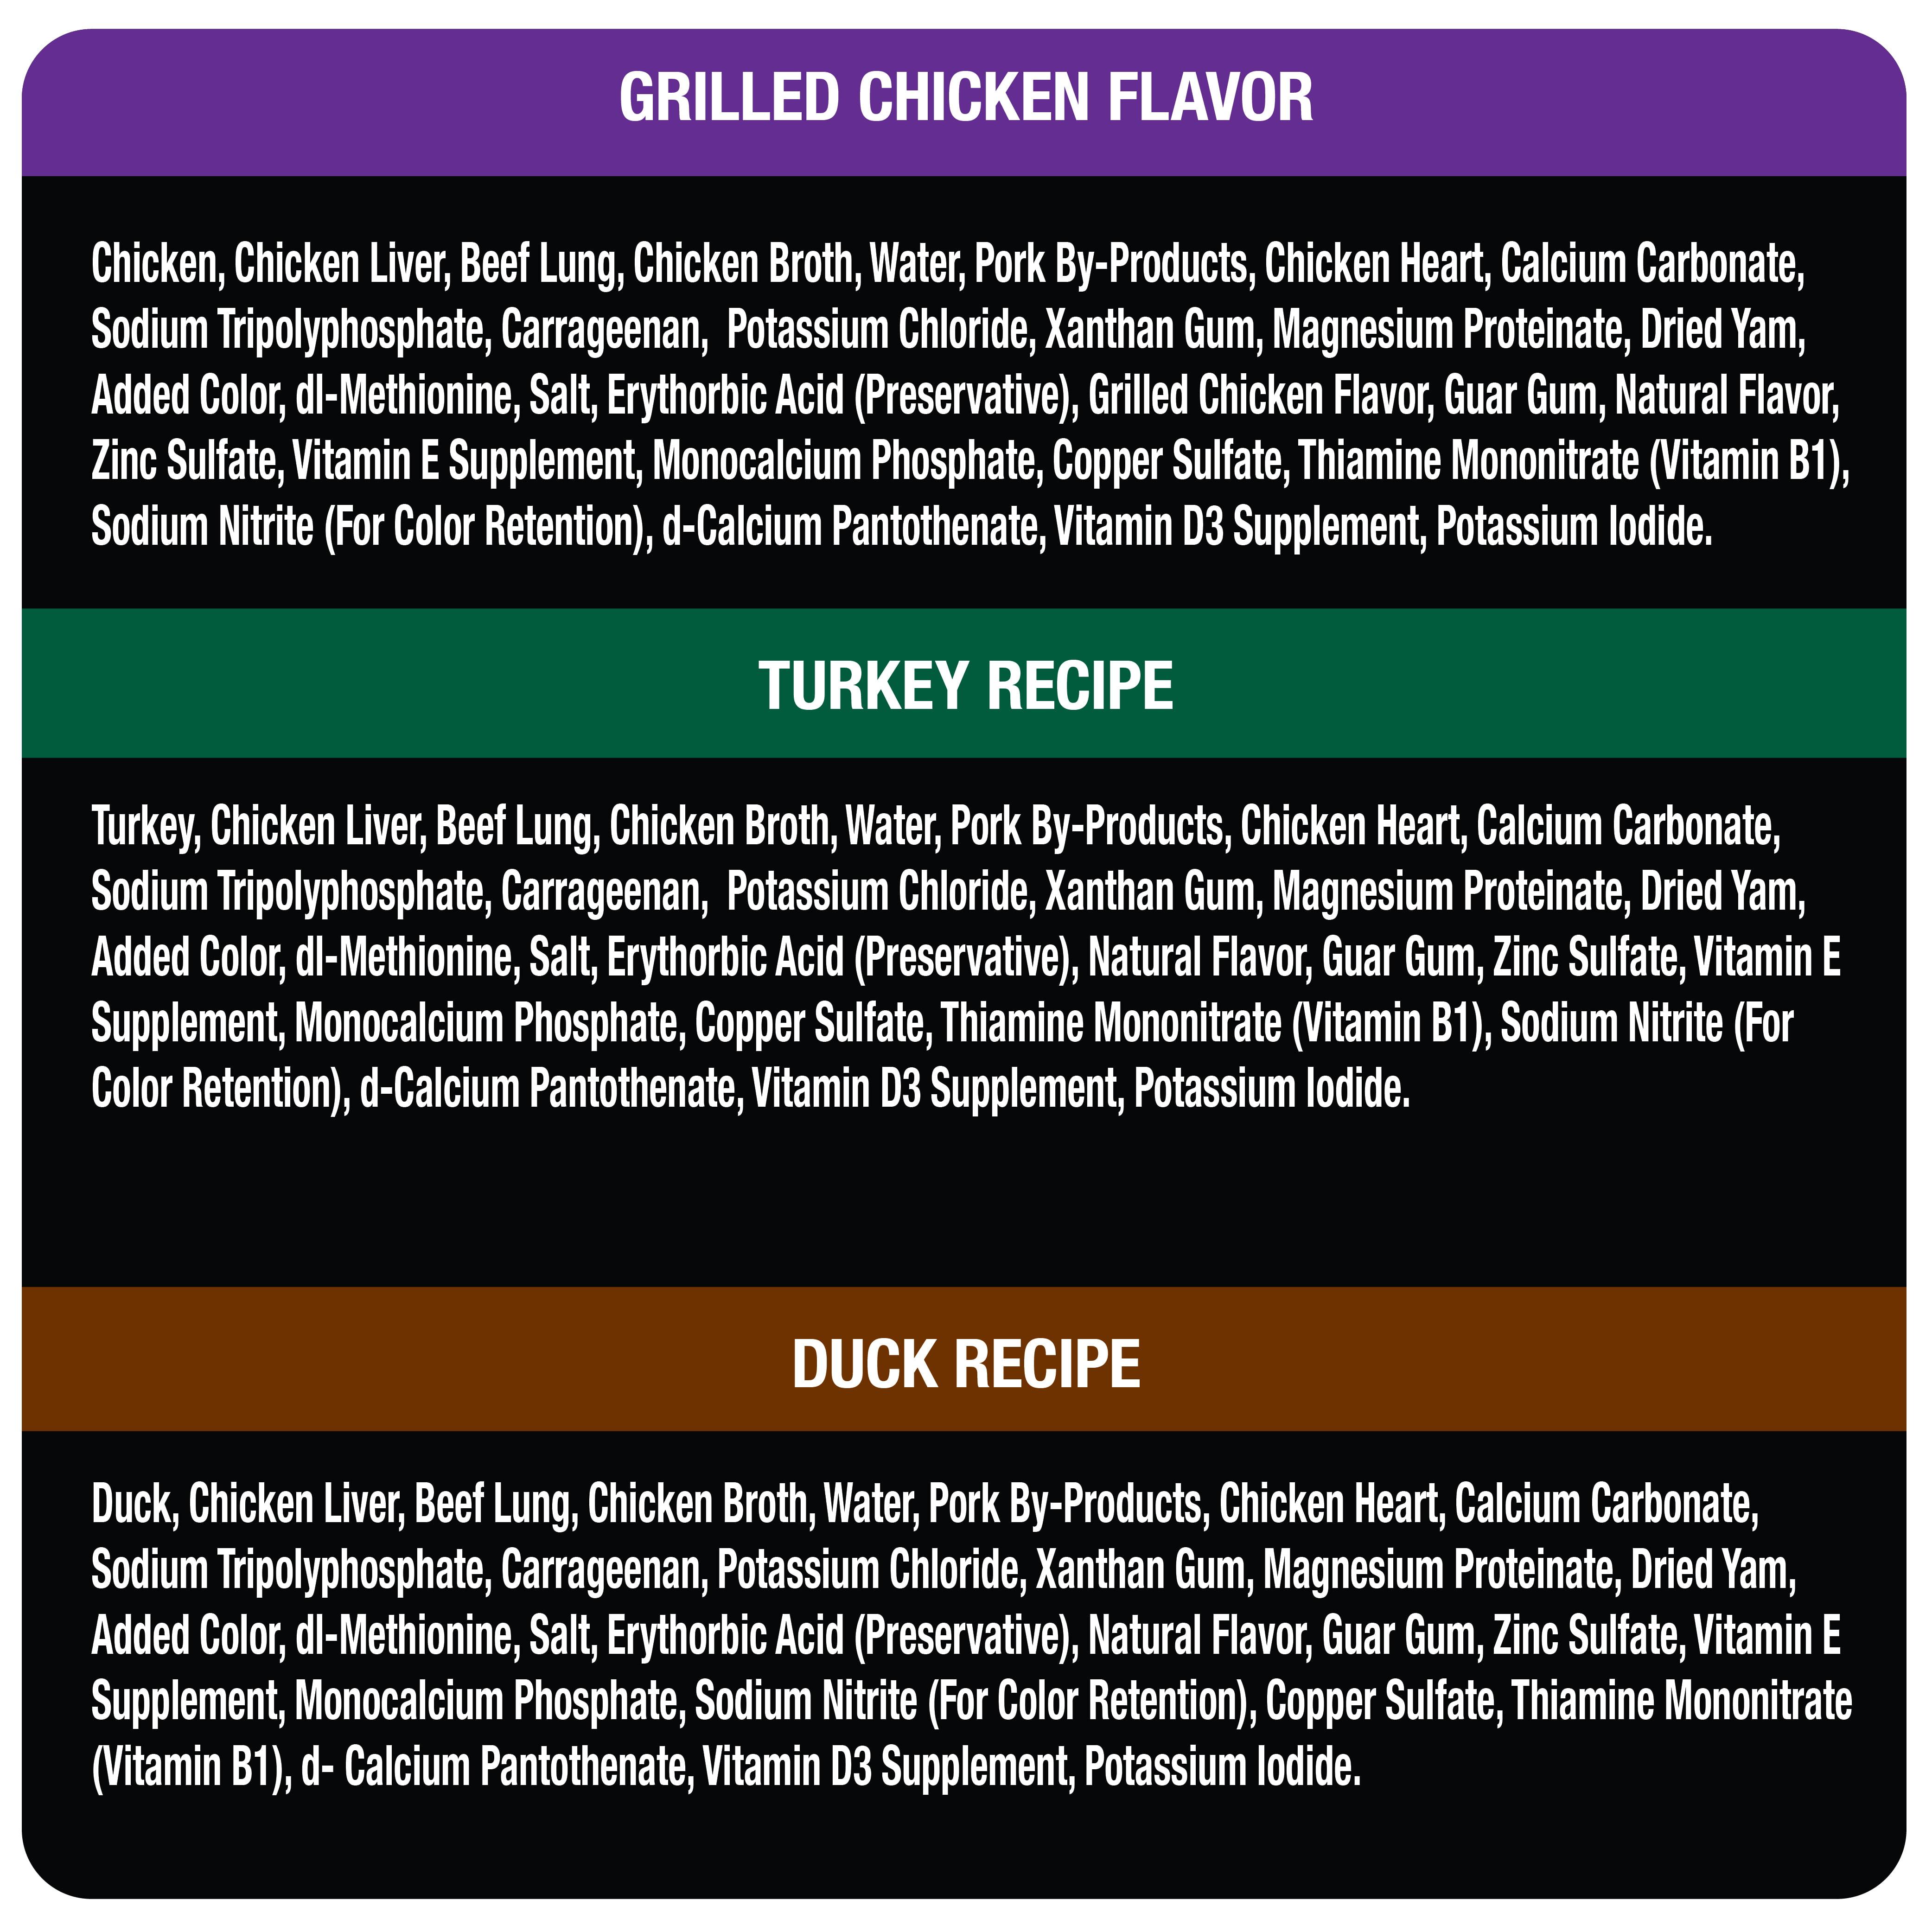 CESAR Wet Dog Food Poultry Lover's Variety Pack Wet Dog Food